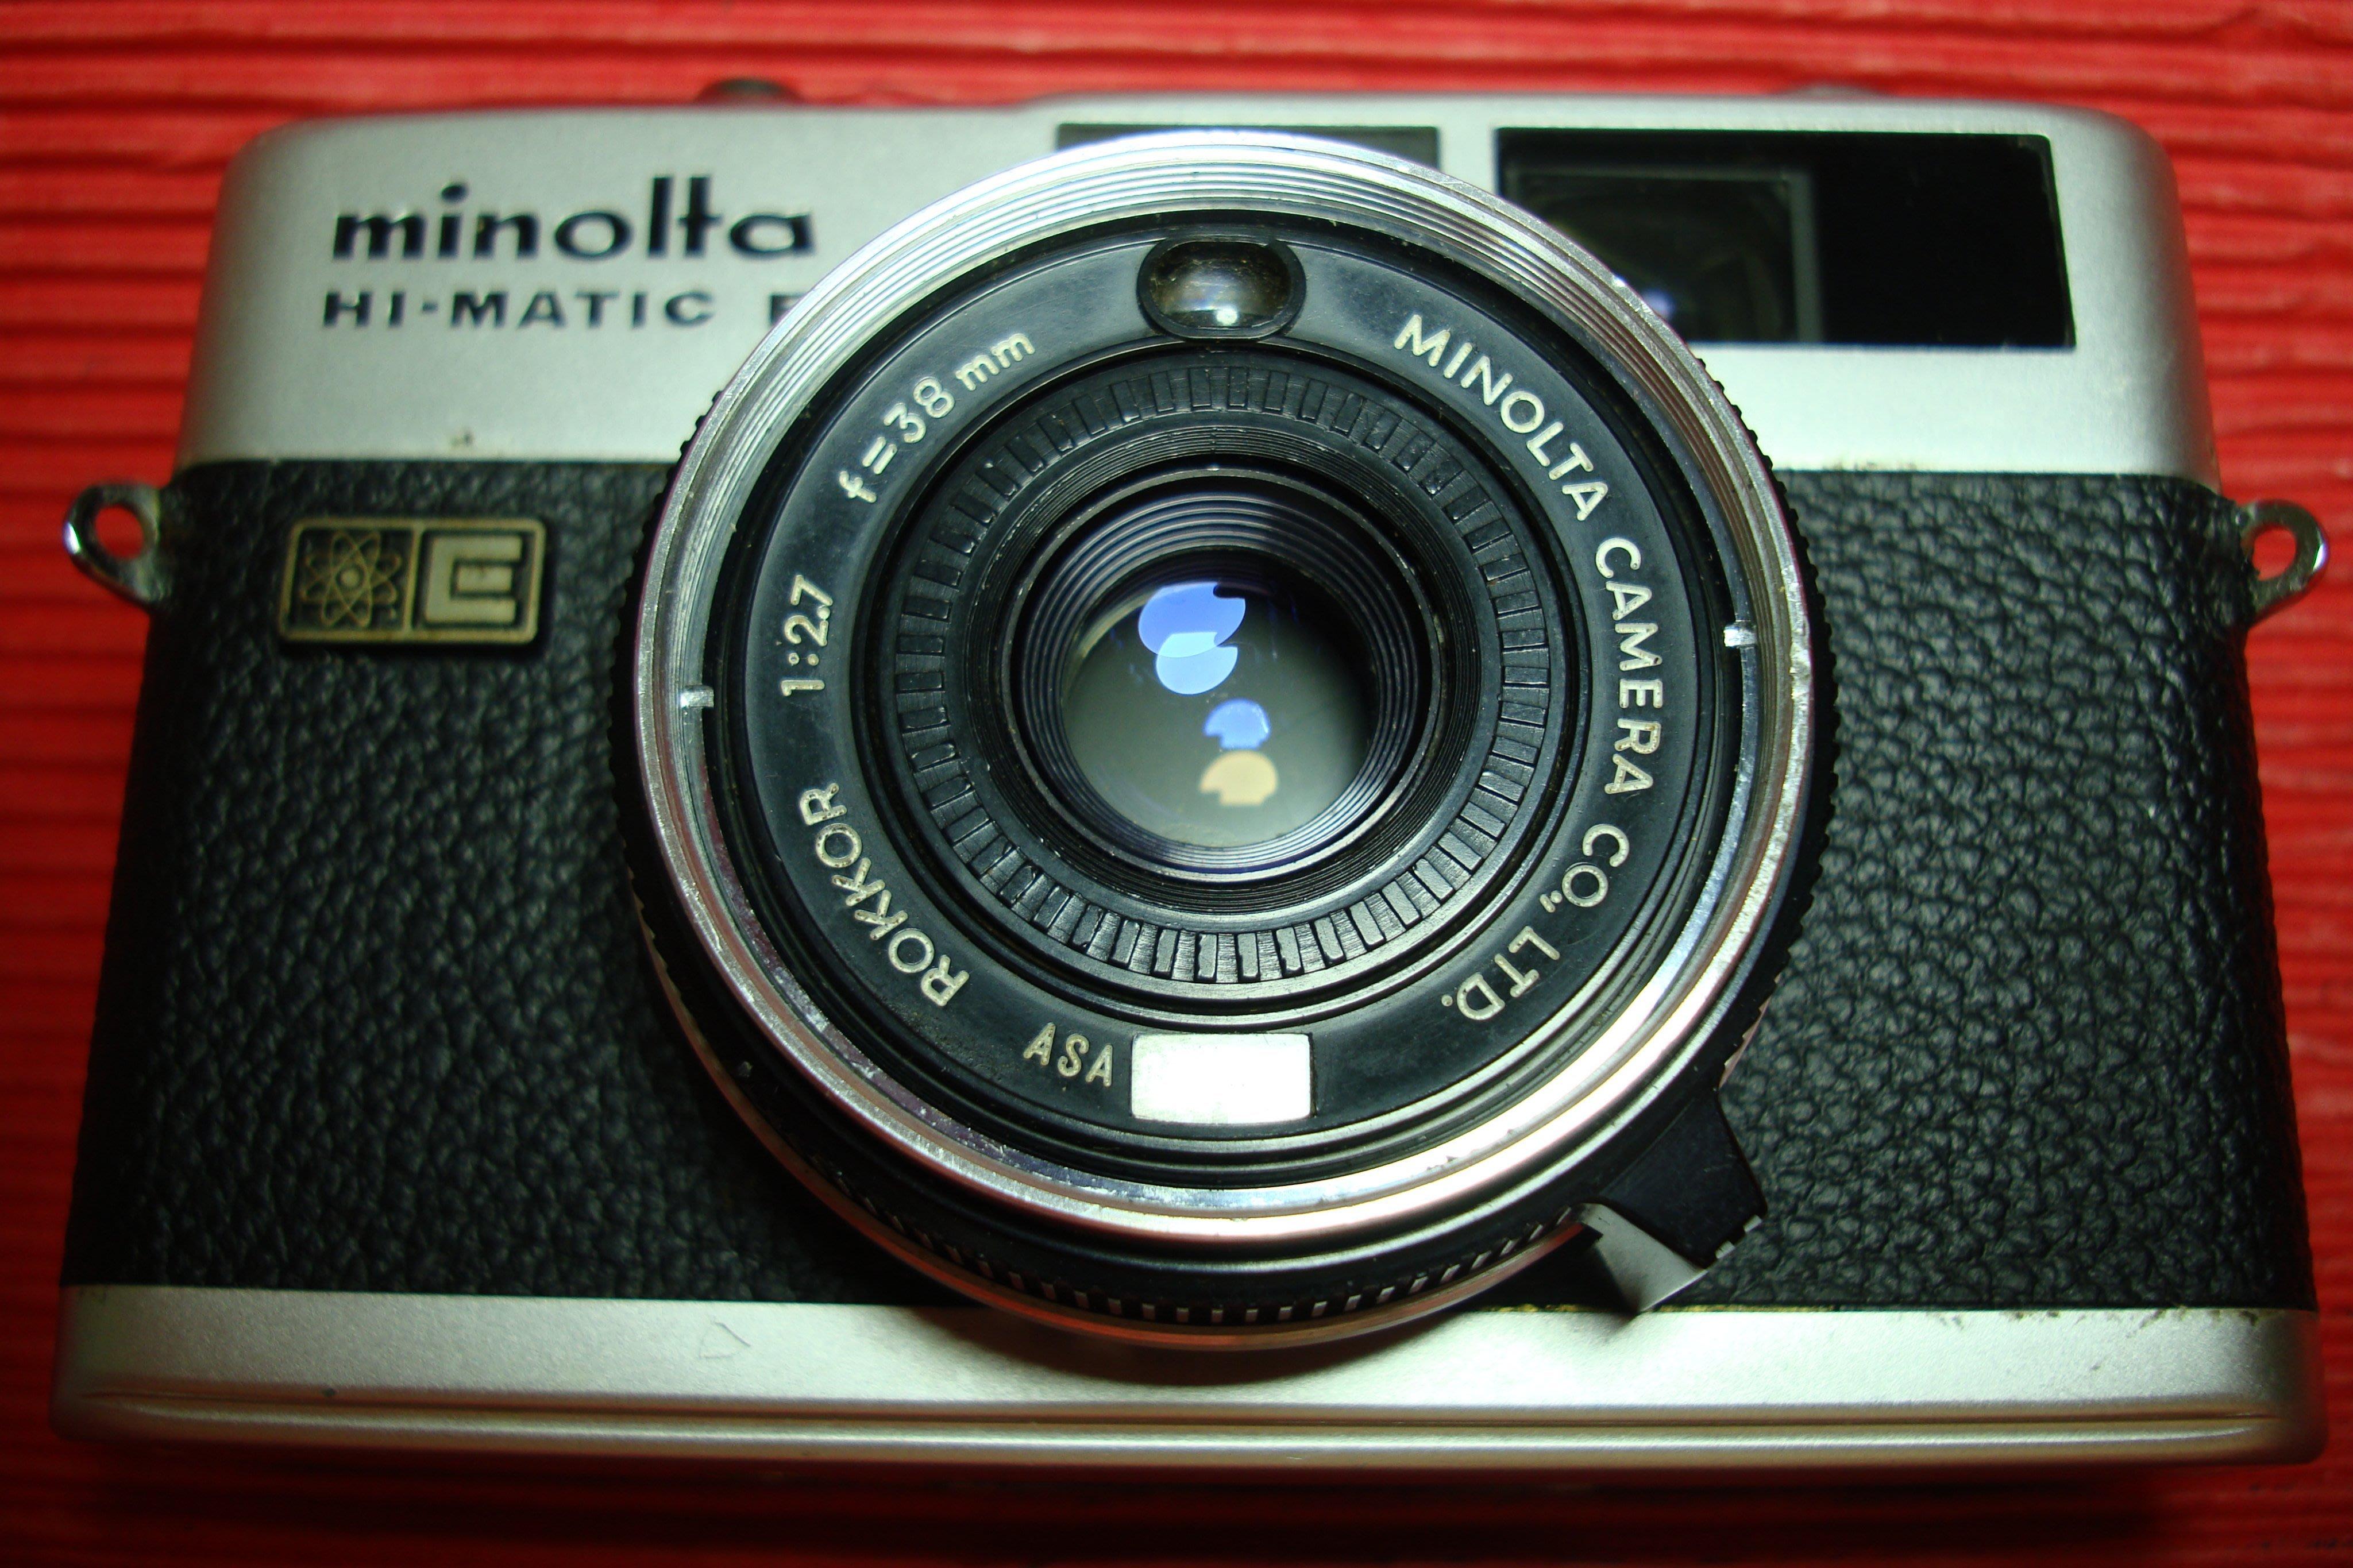 Minolta Hi-Matic F 38mm f2.7 (疊影對焦)